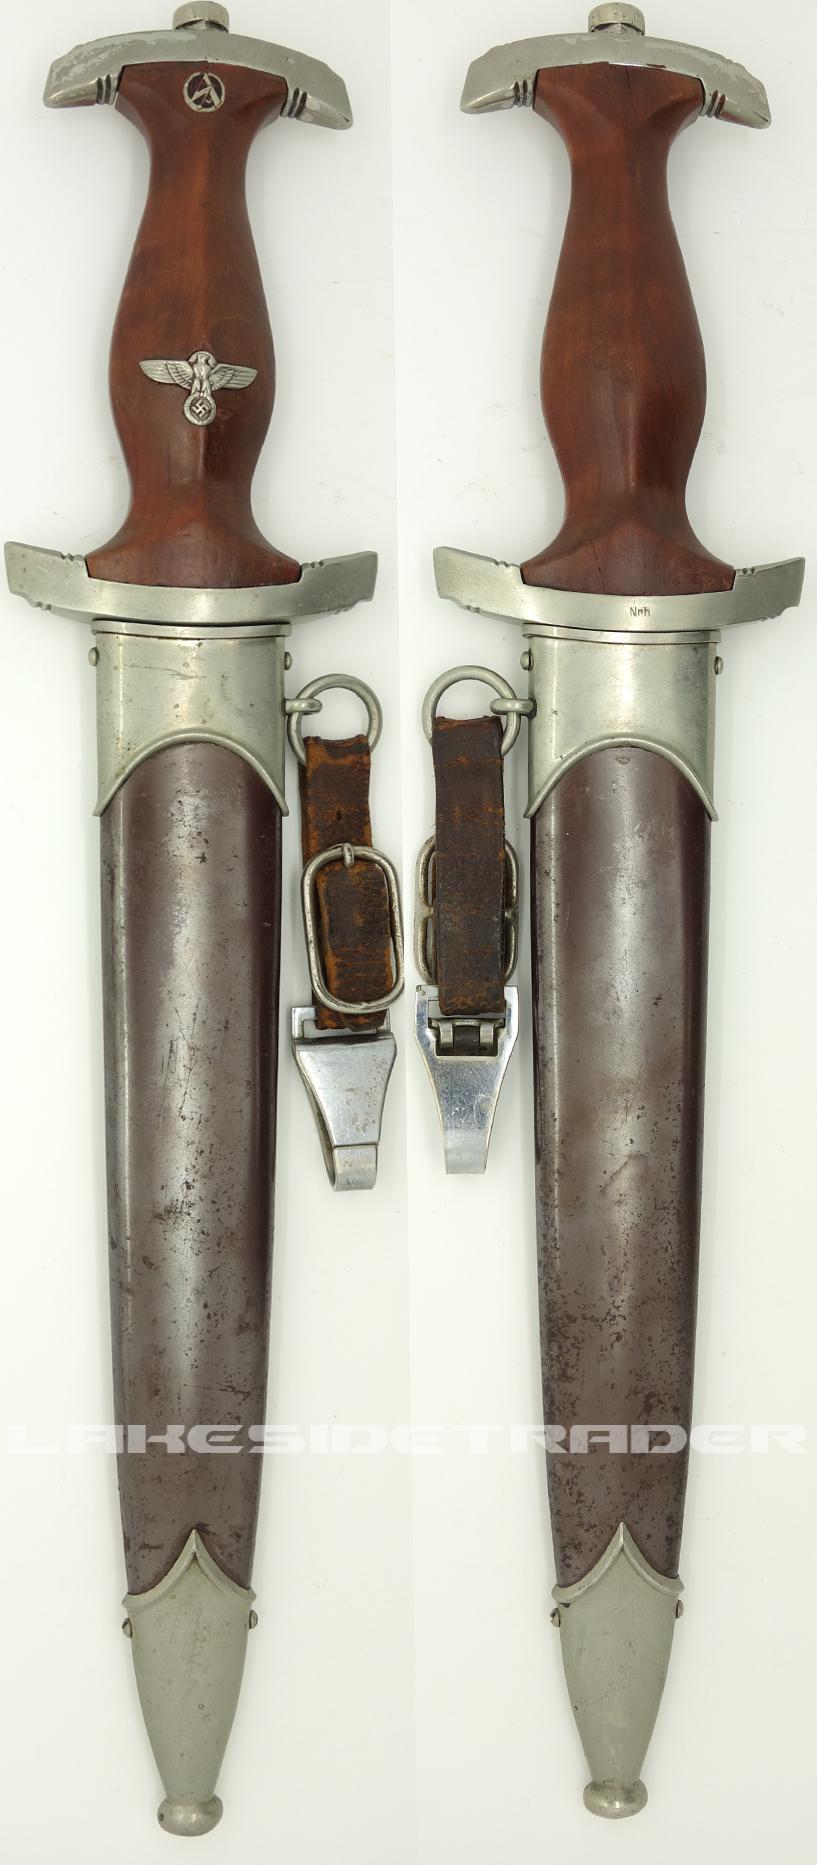 Ground Rohm SA Dagger by A. Wingen